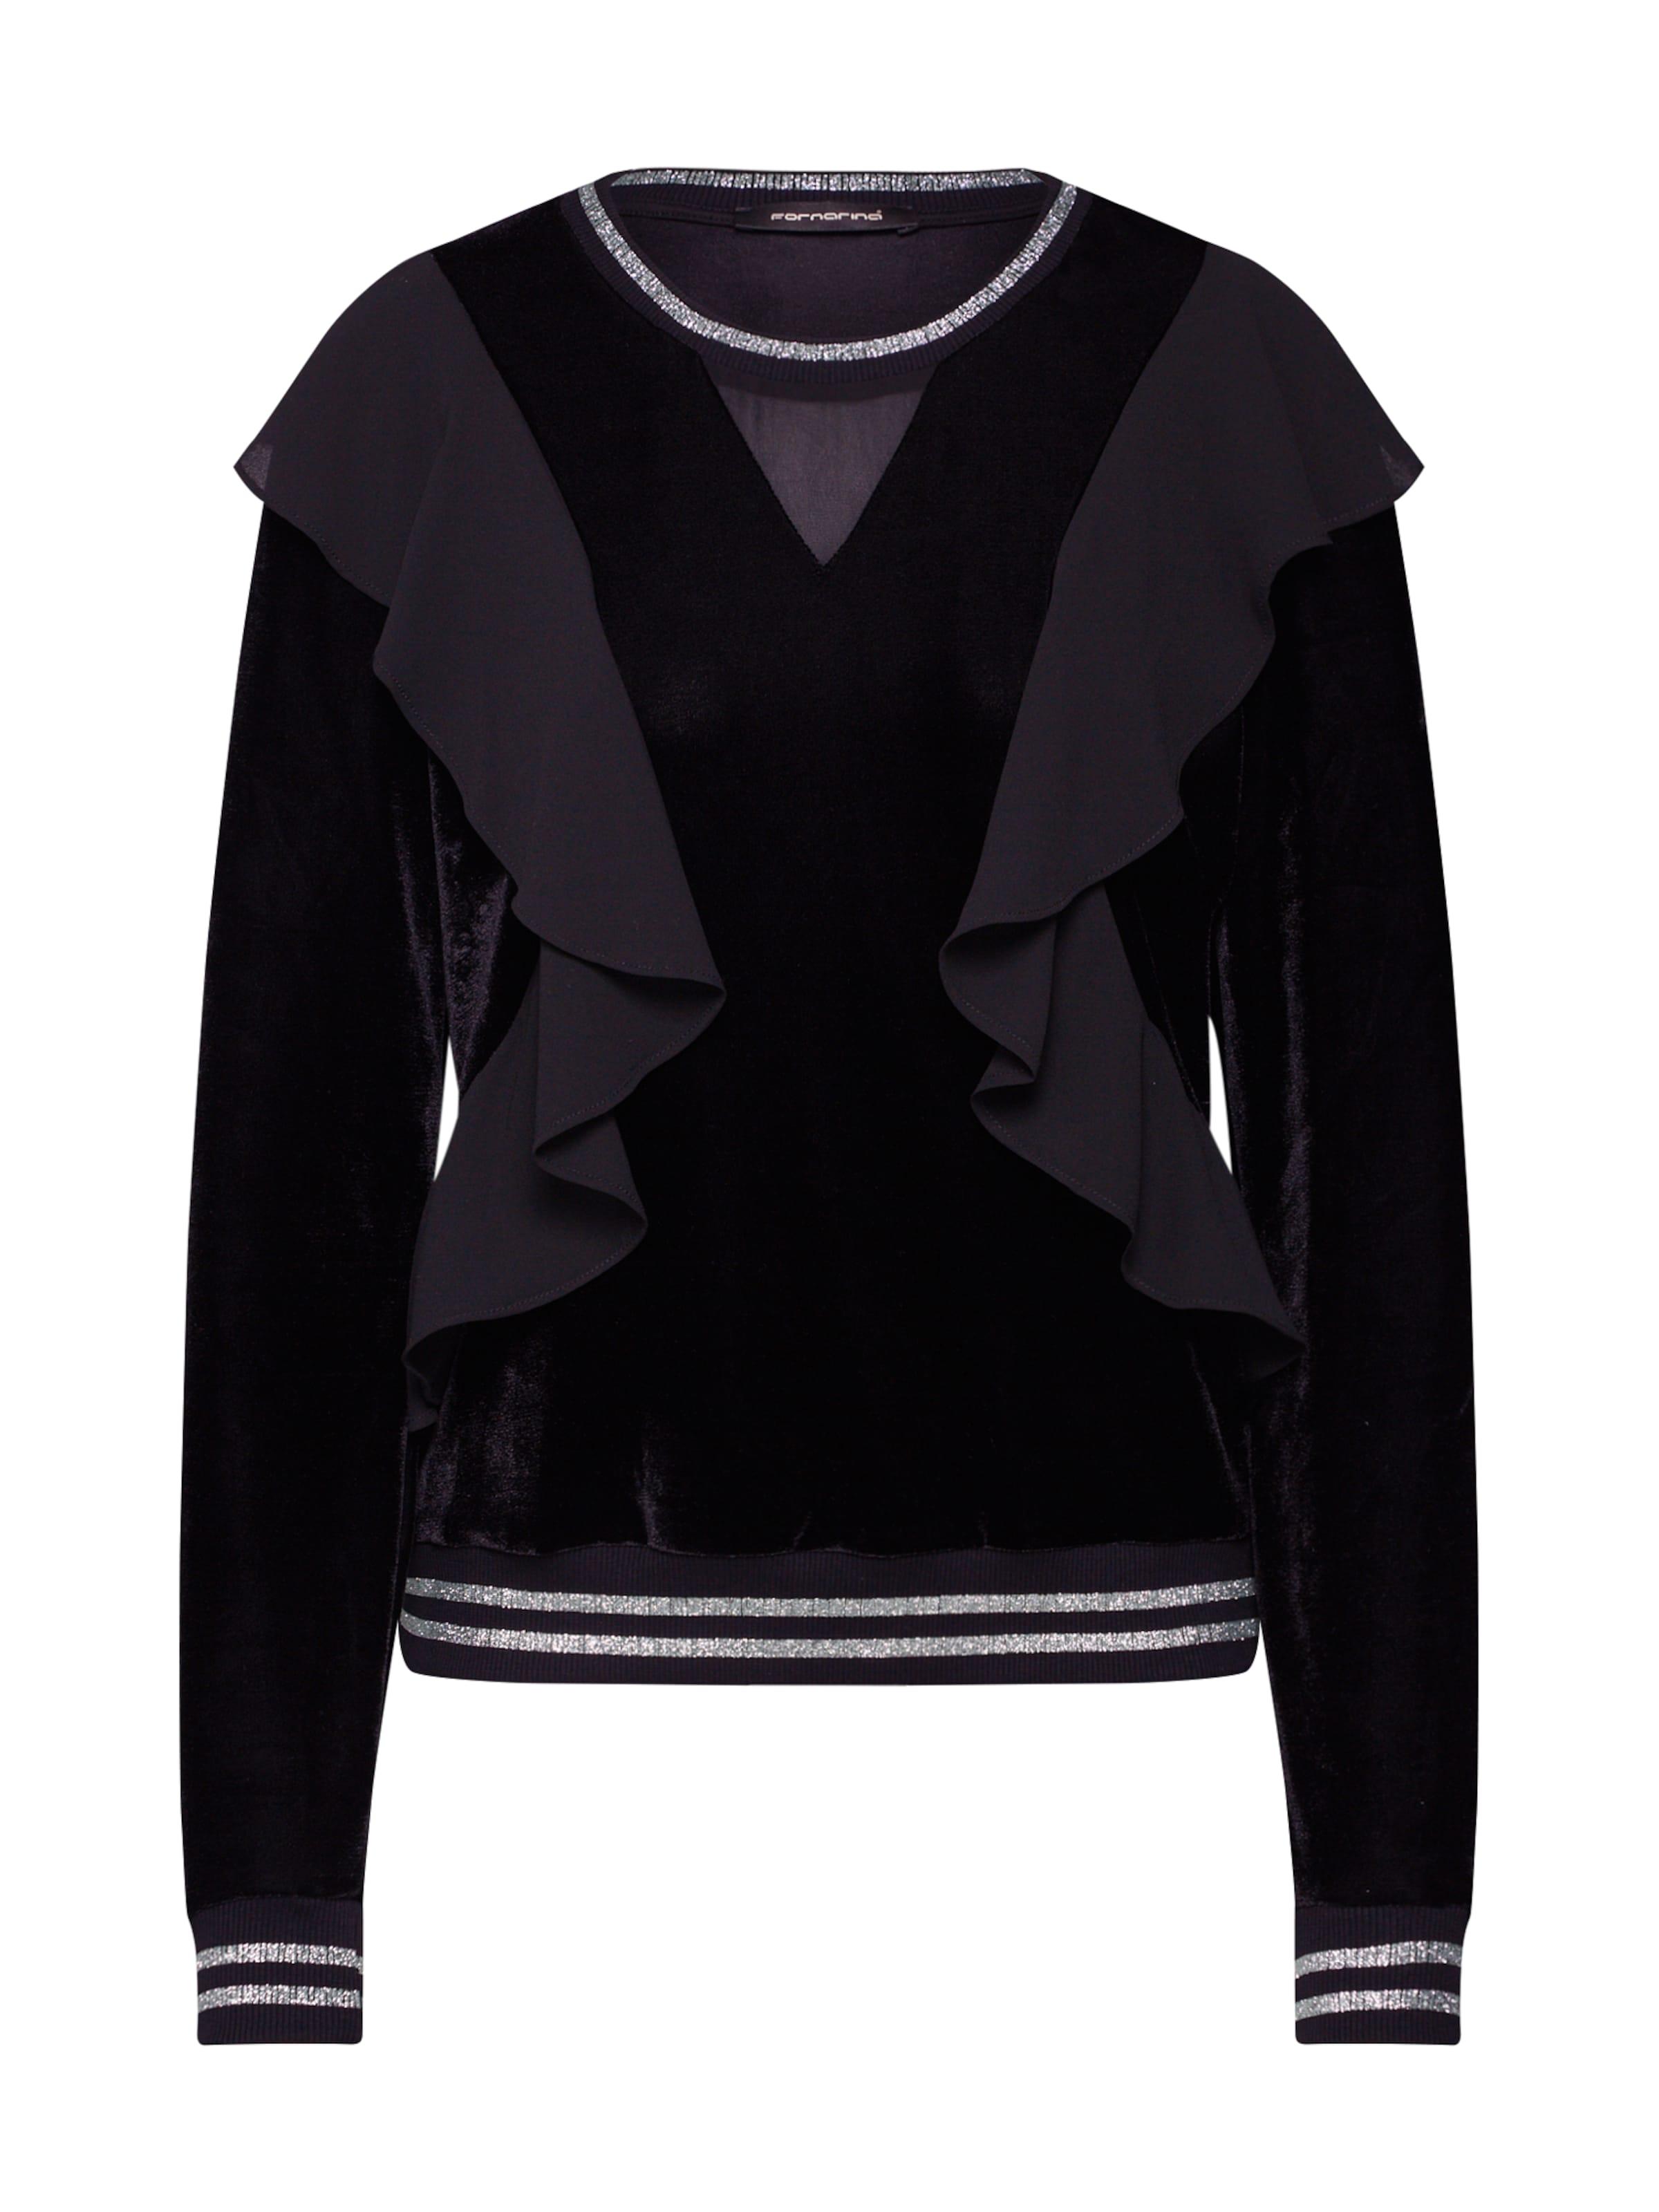 98b152c295e95f Fornarina In Sweatshirt Zwart Sweatshirt Fornarina  rie  0vNOmn8w